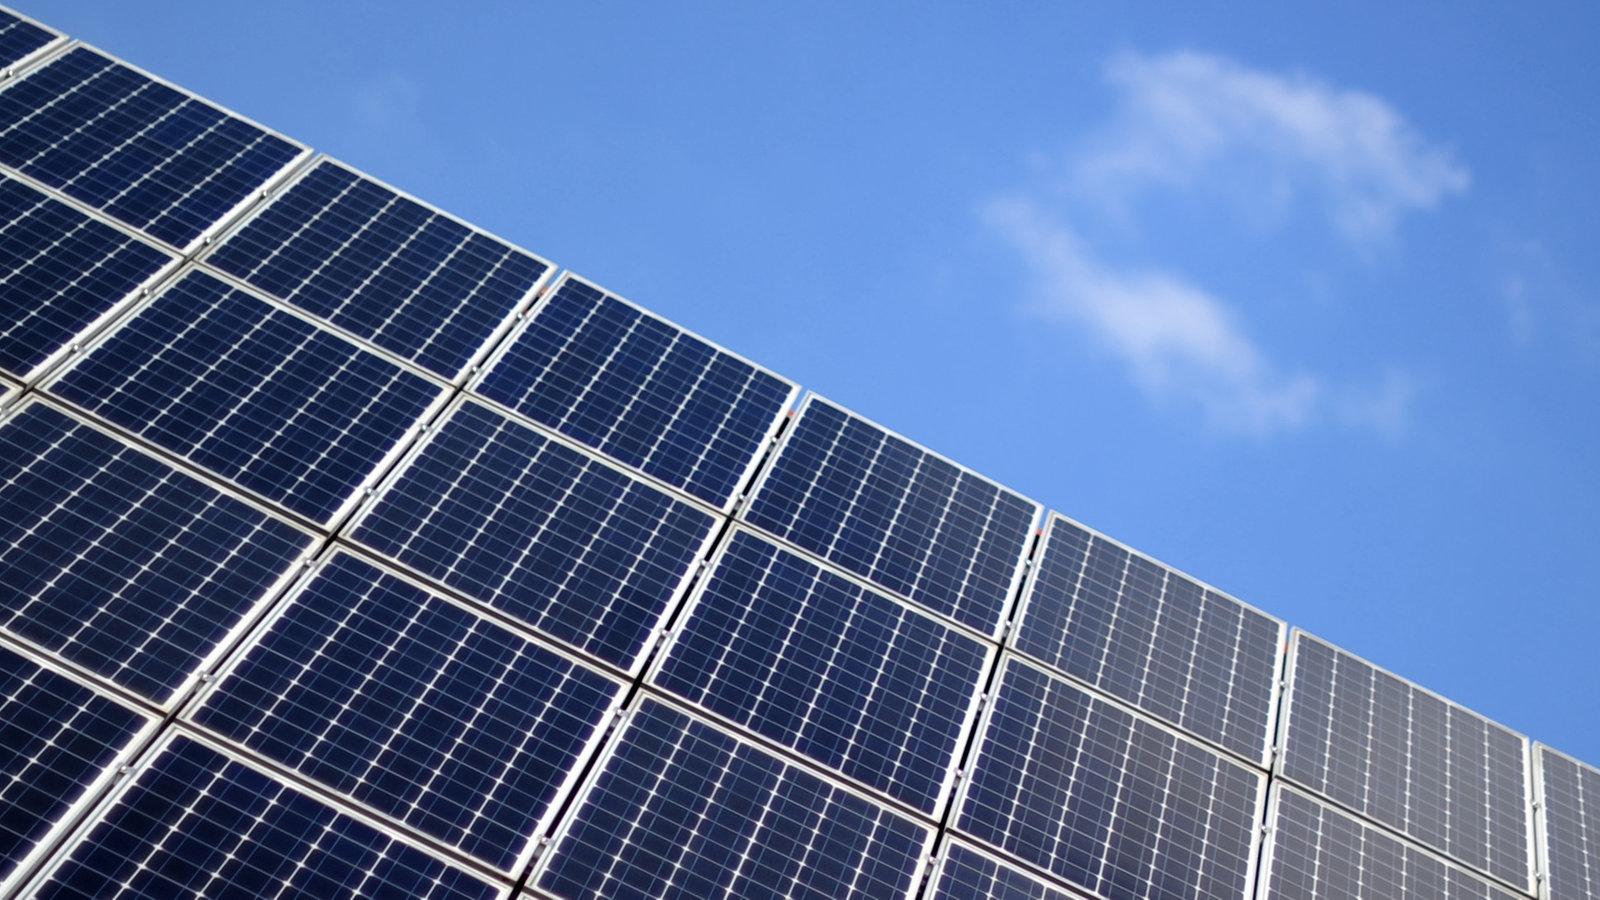 solarenergie dachkataster energie technik planet wissen. Black Bedroom Furniture Sets. Home Design Ideas